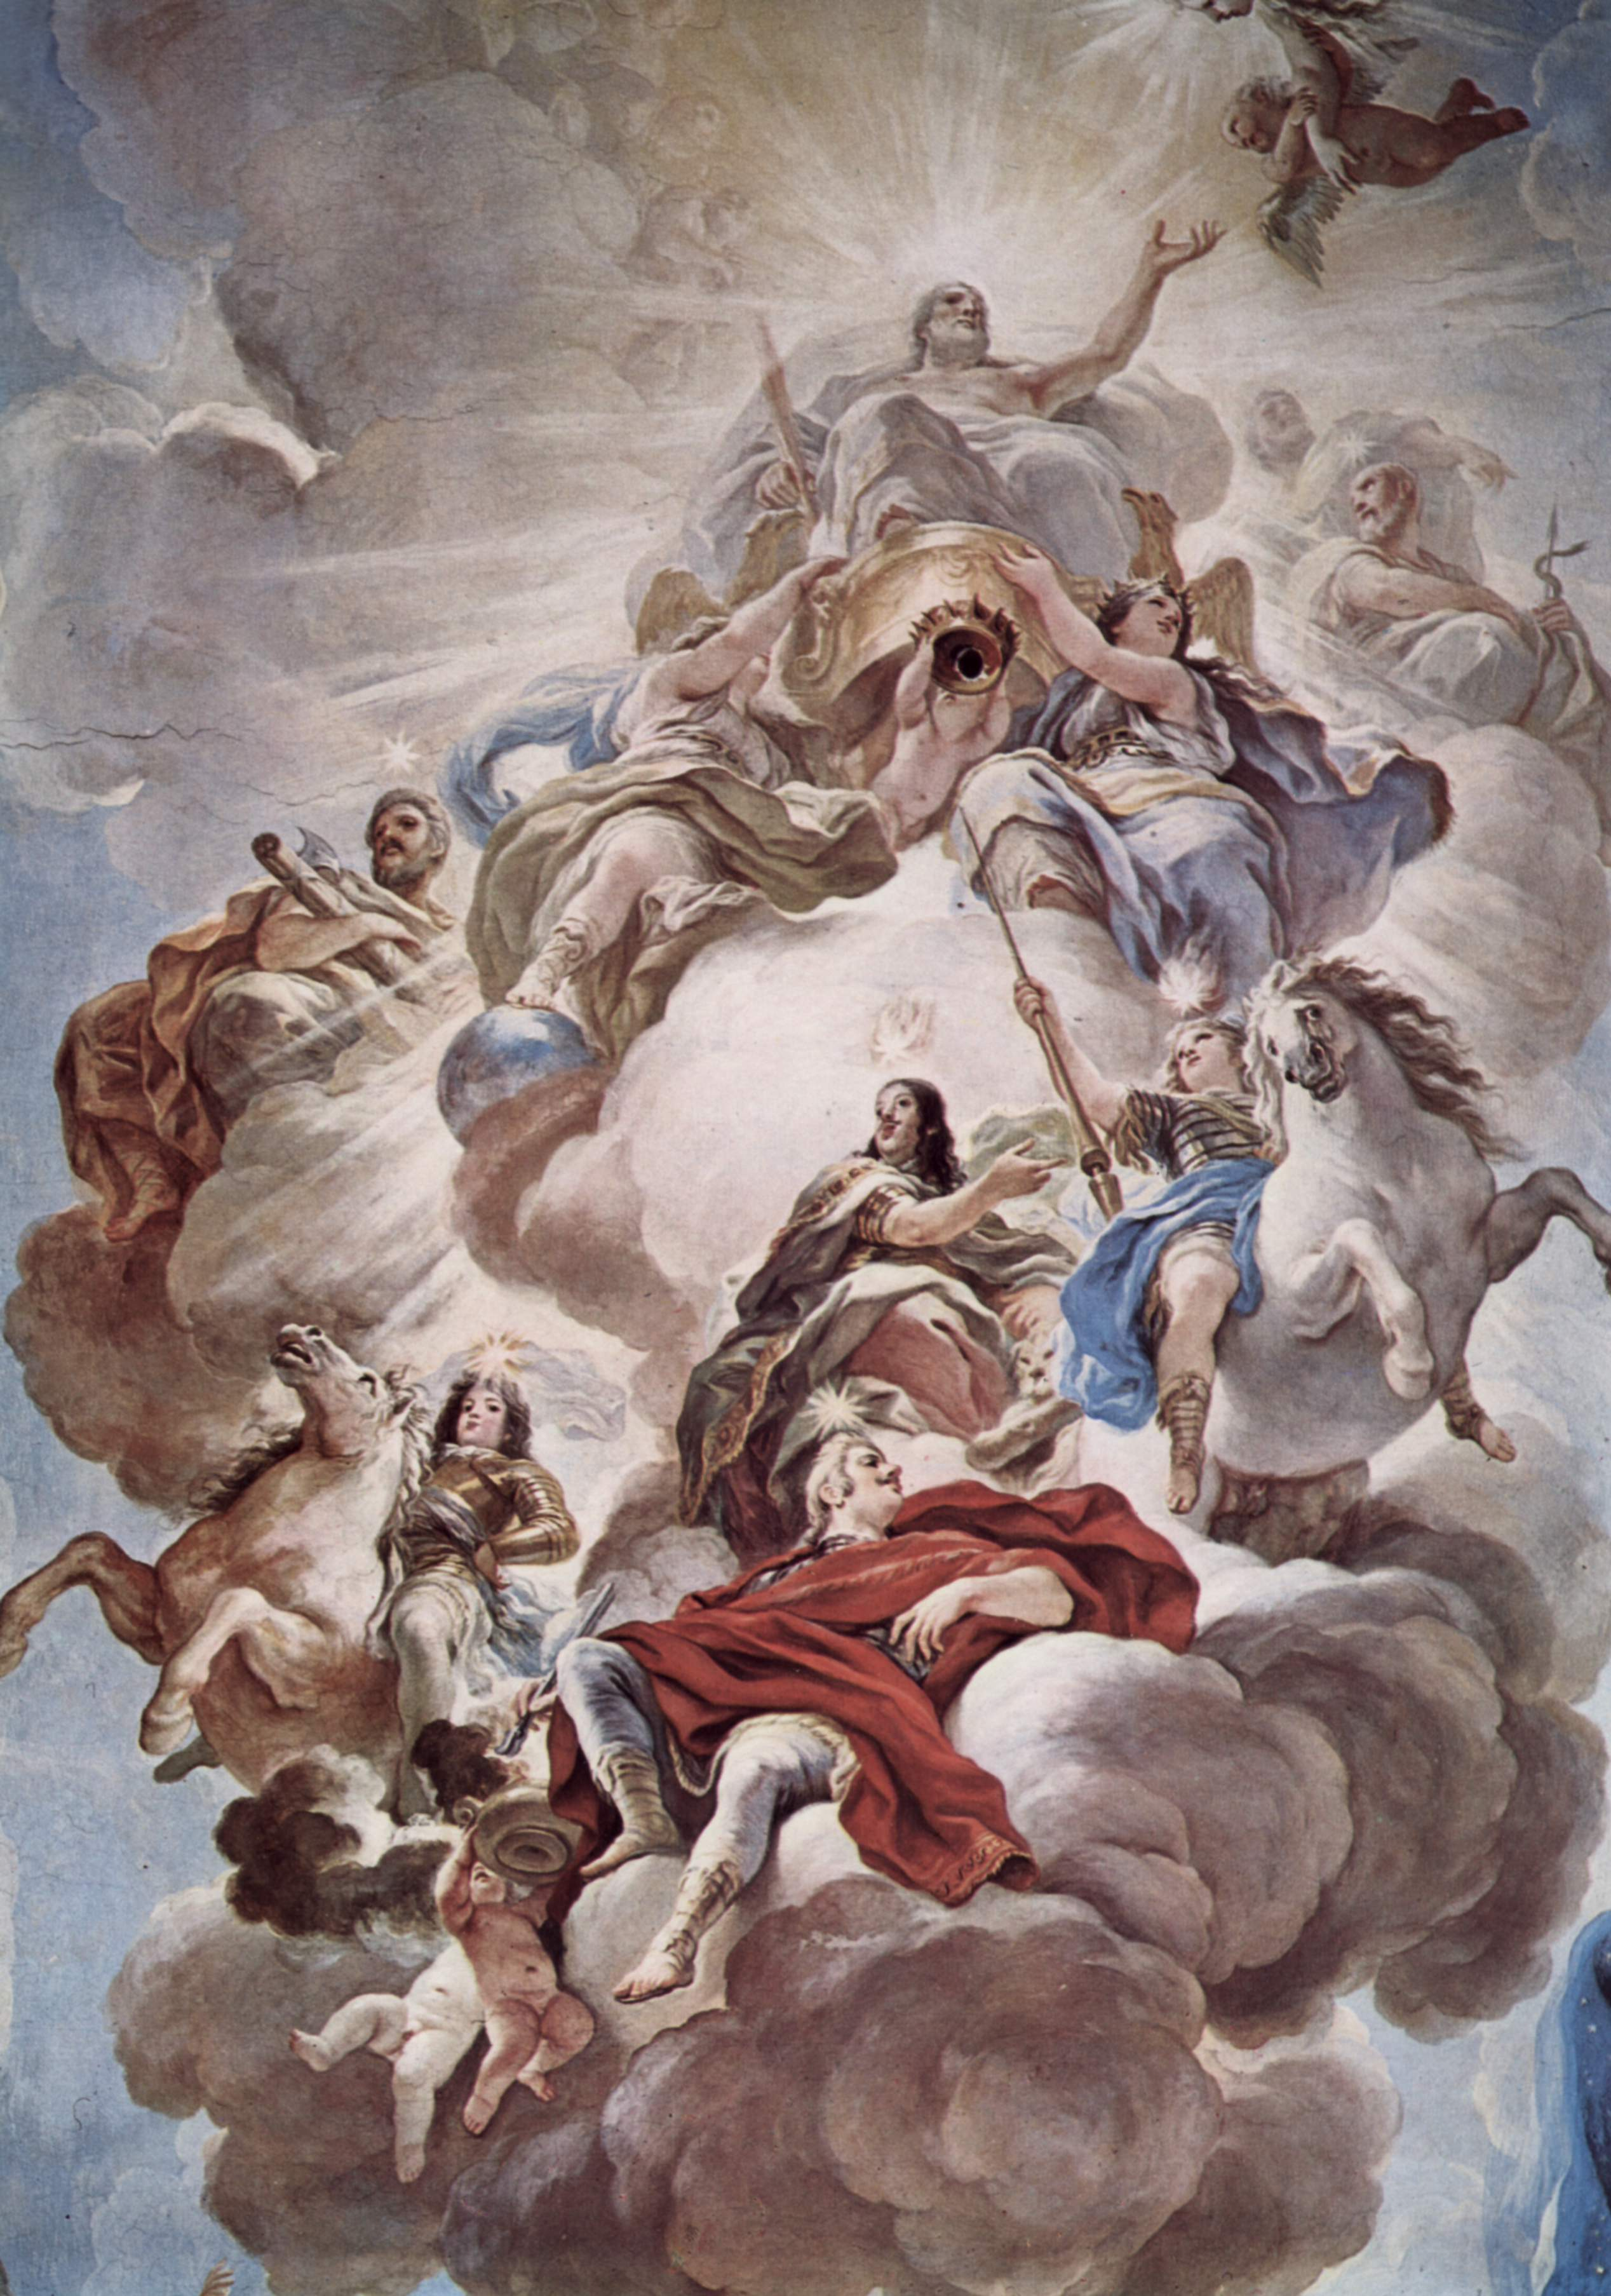 Триумф Медичи на облаках Олимпа, Джордано Лука